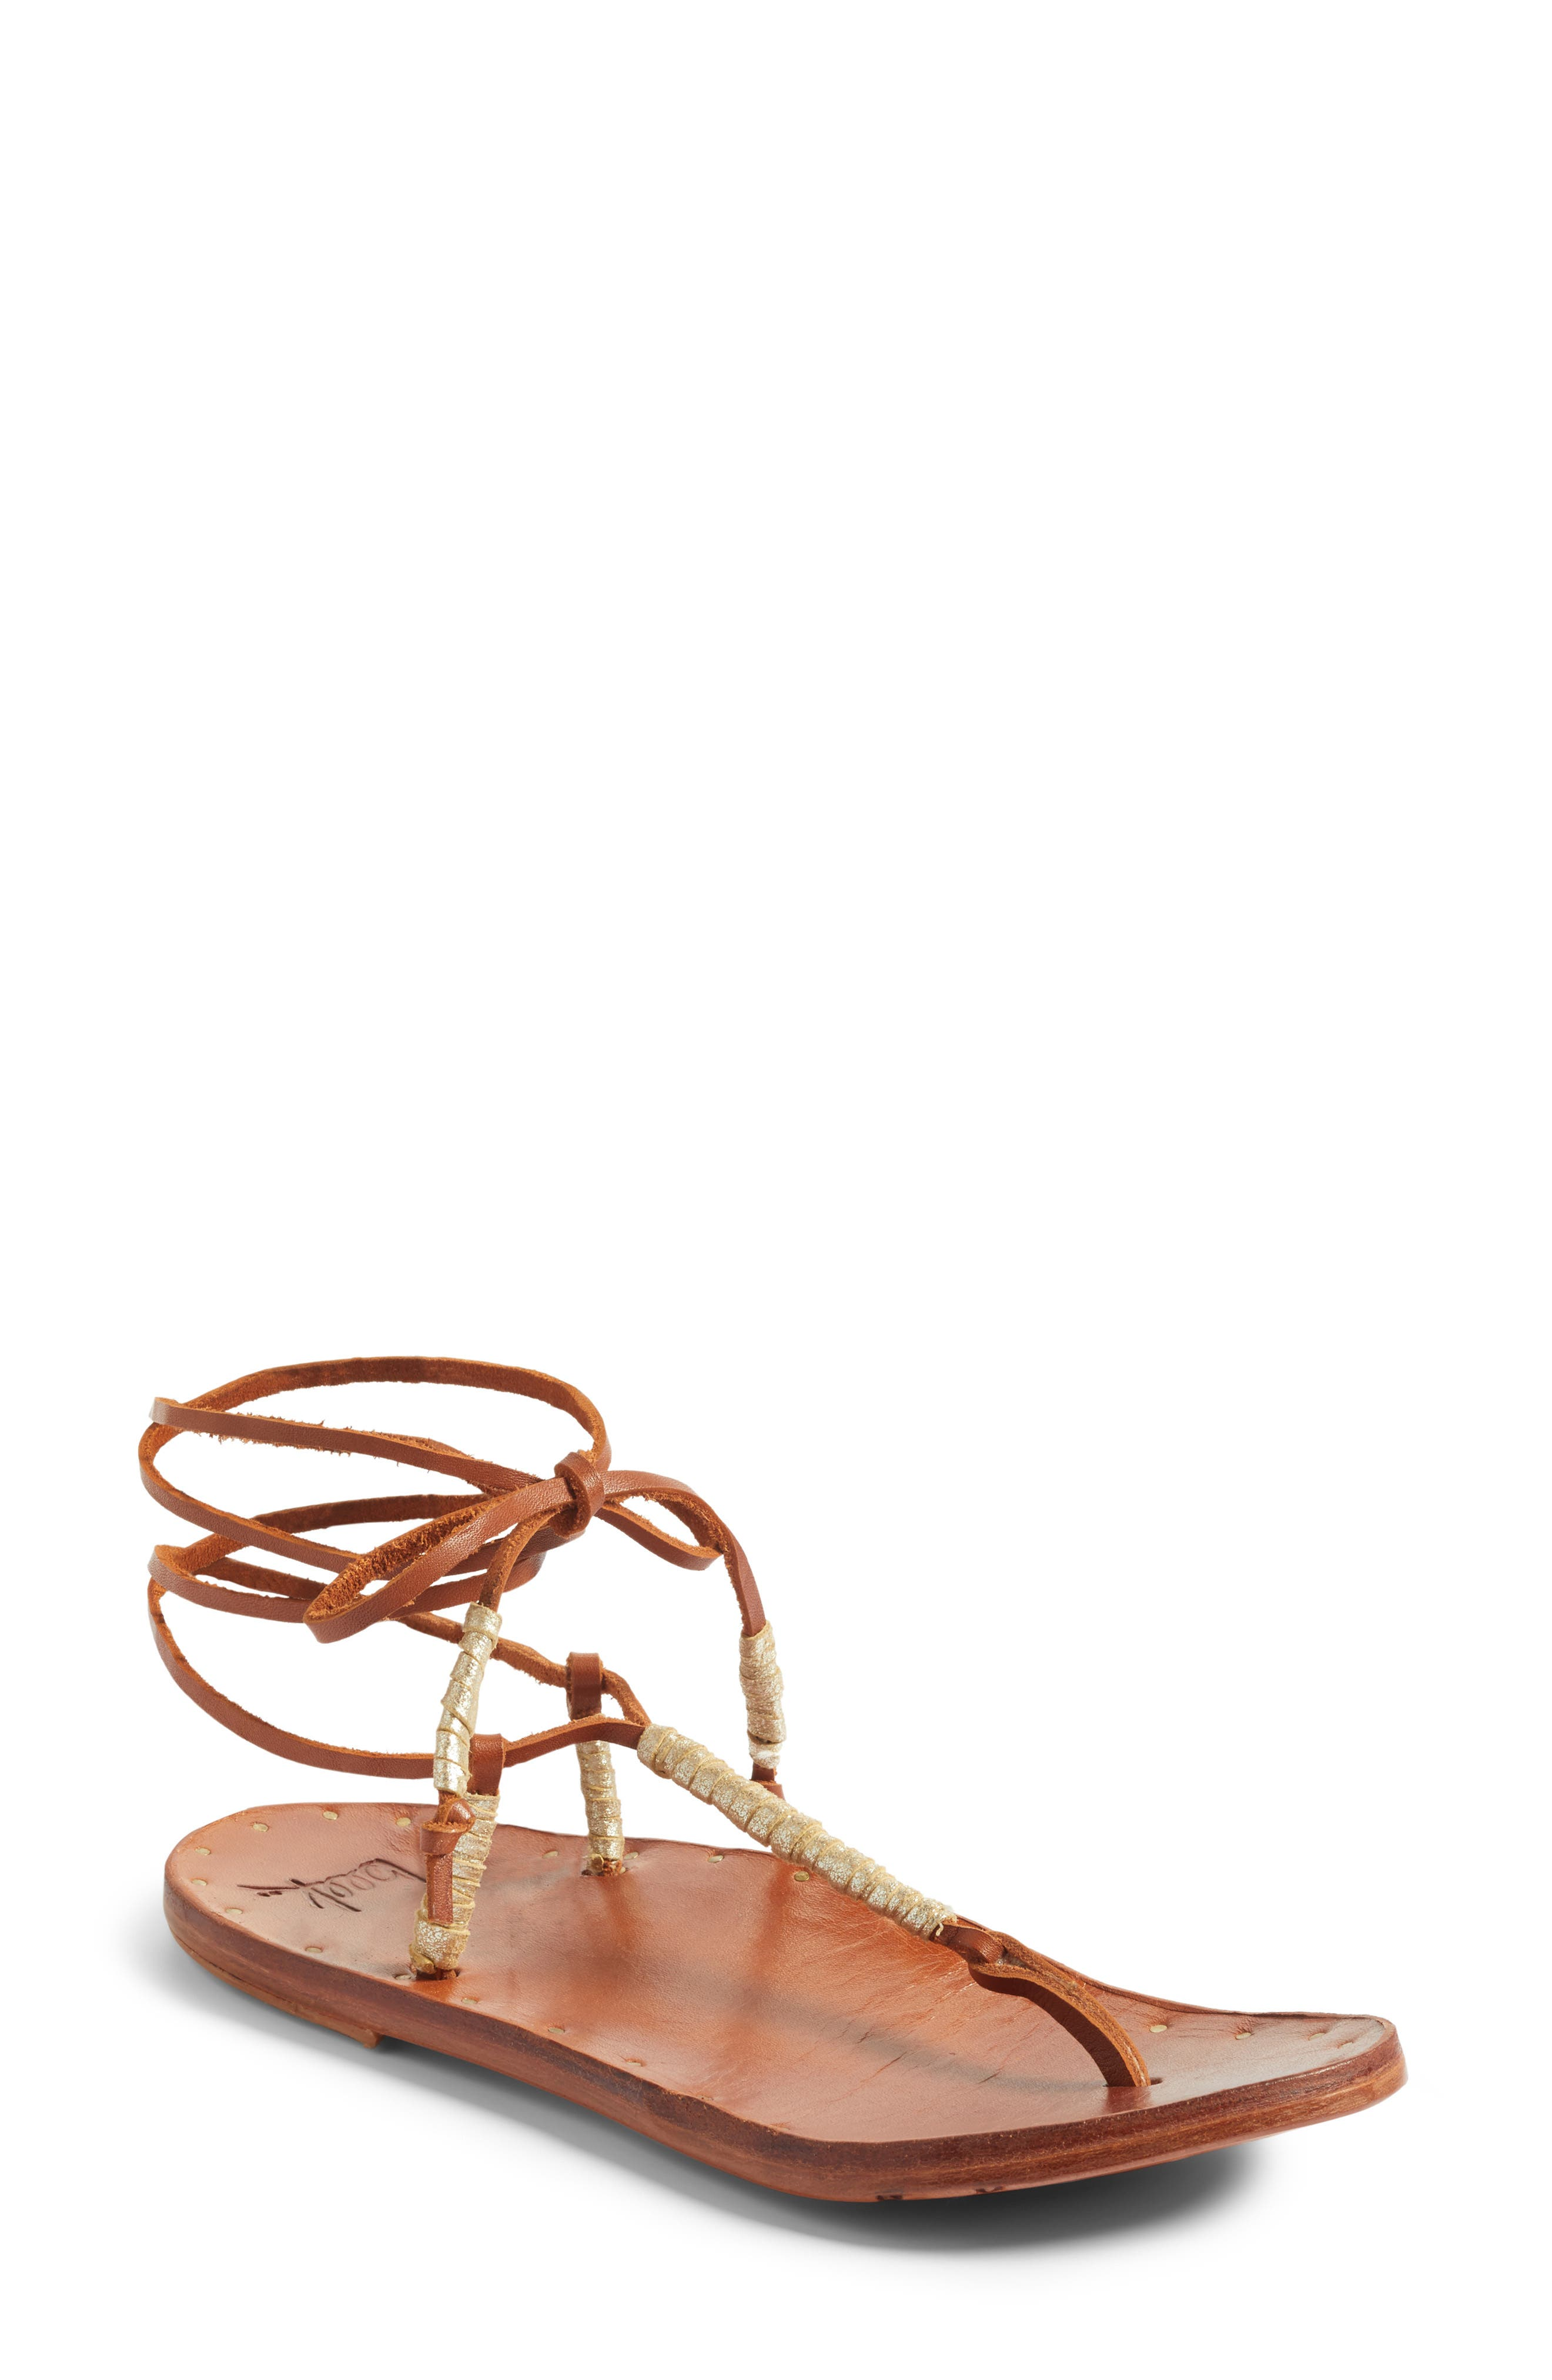 Main Image - Beek Crane Sandal (Women)